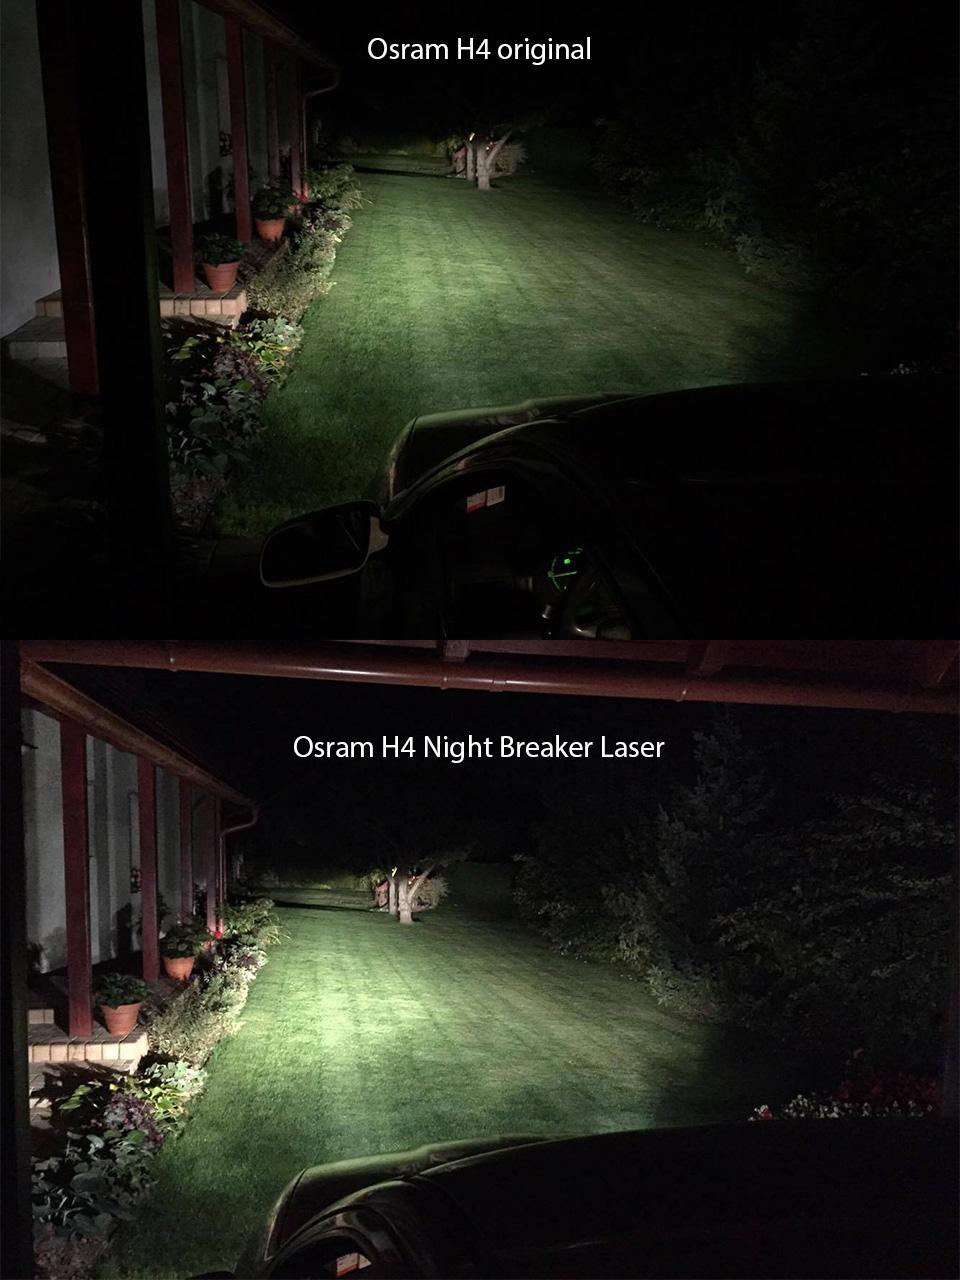 osram h4 12v 60 55w night breaker laser box auto iarovky. Black Bedroom Furniture Sets. Home Design Ideas